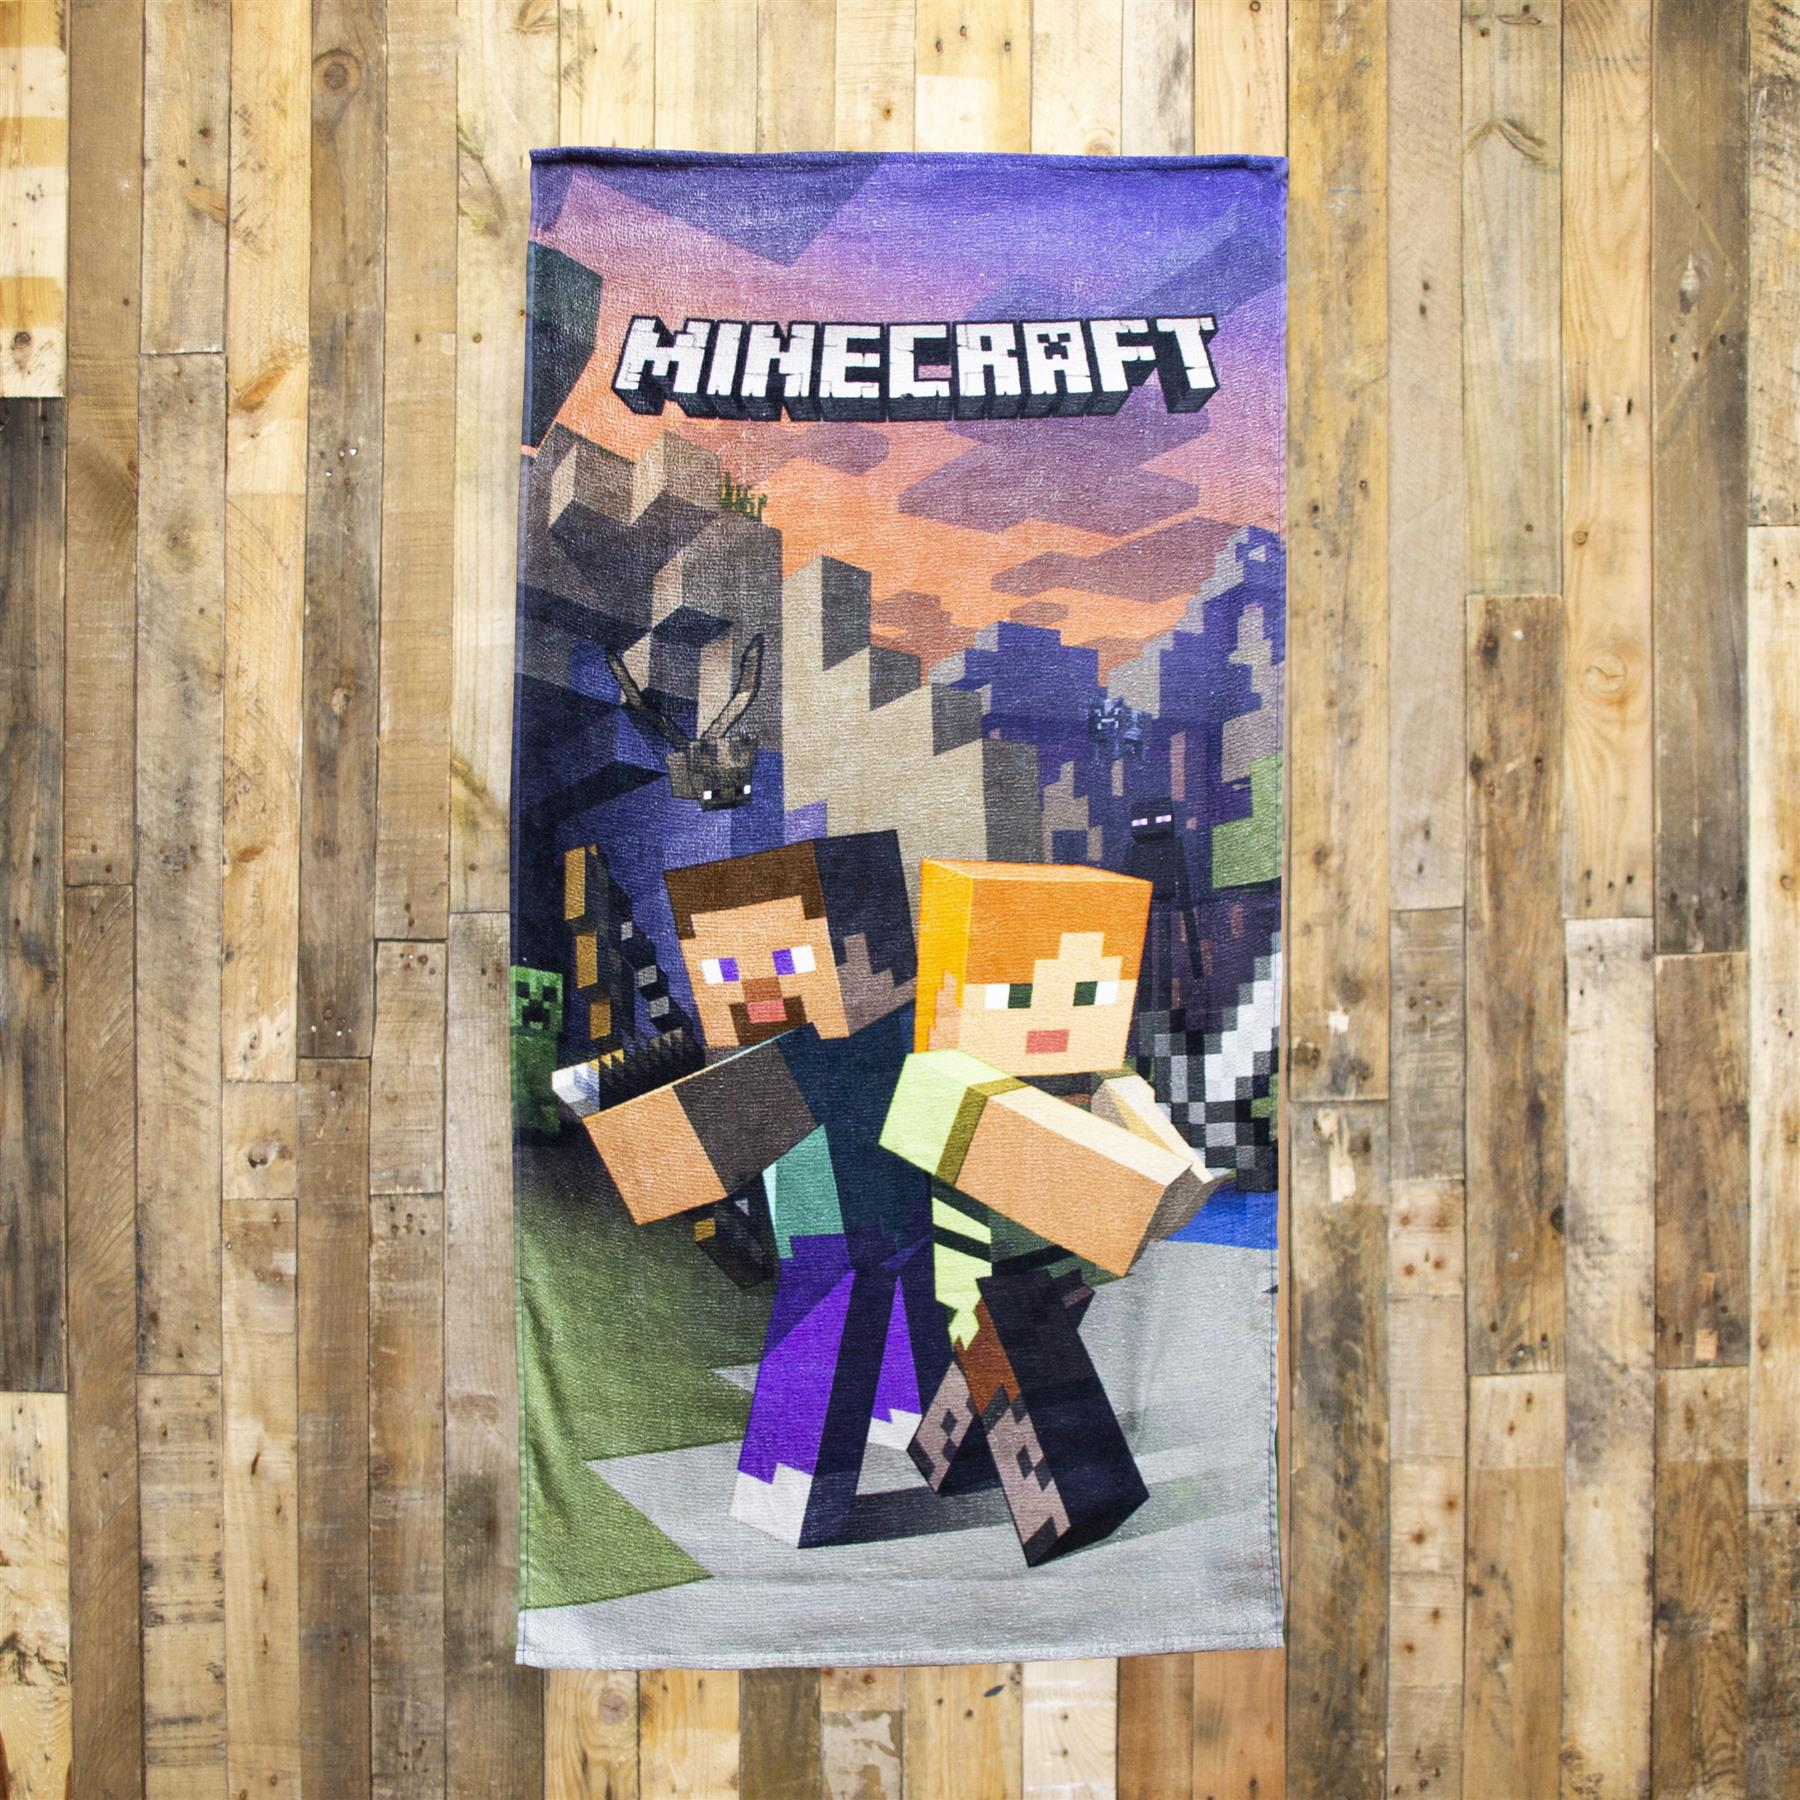 miniatura 52 - Minecraft Biancheria da letto Creeper PIUMONI Asciugamano Cuscino Coperta-venduta separatamente